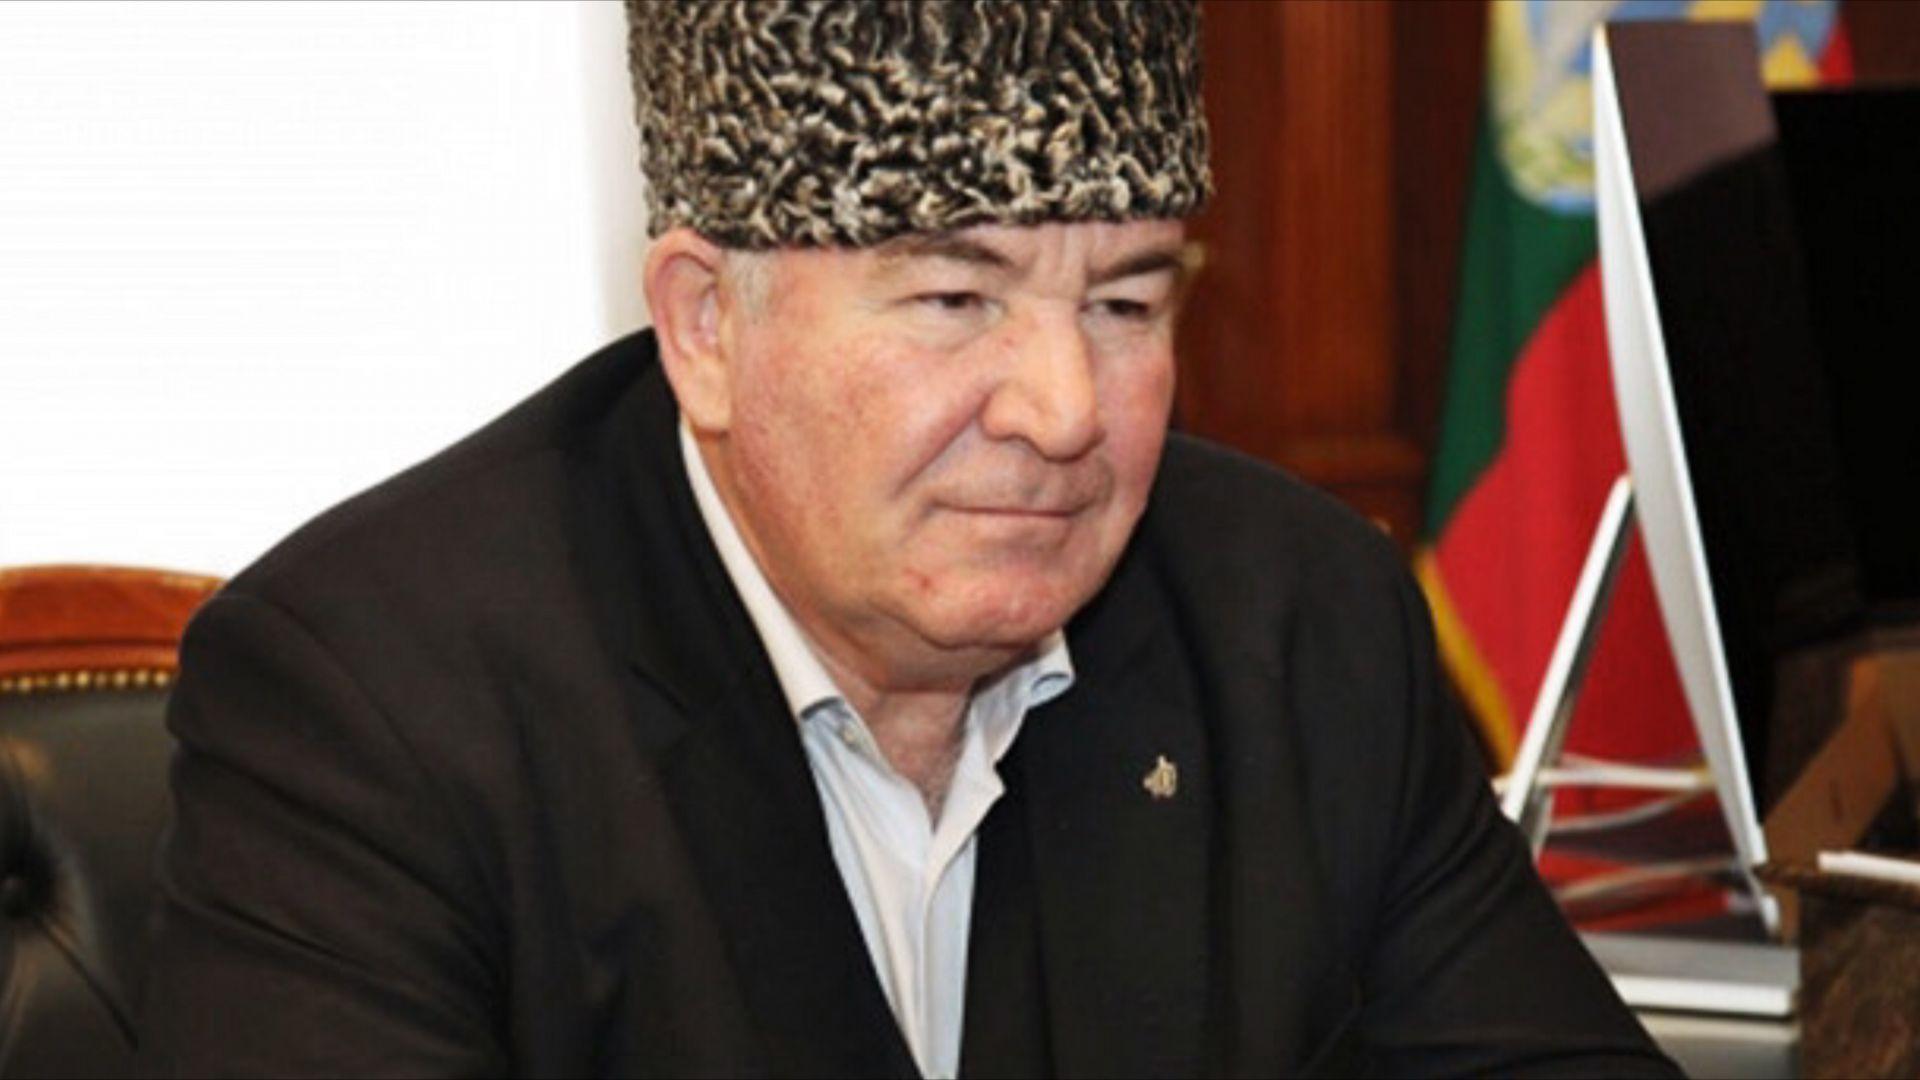 Муфтий Бердиев сохранил пост главы Координационного центра мусульман